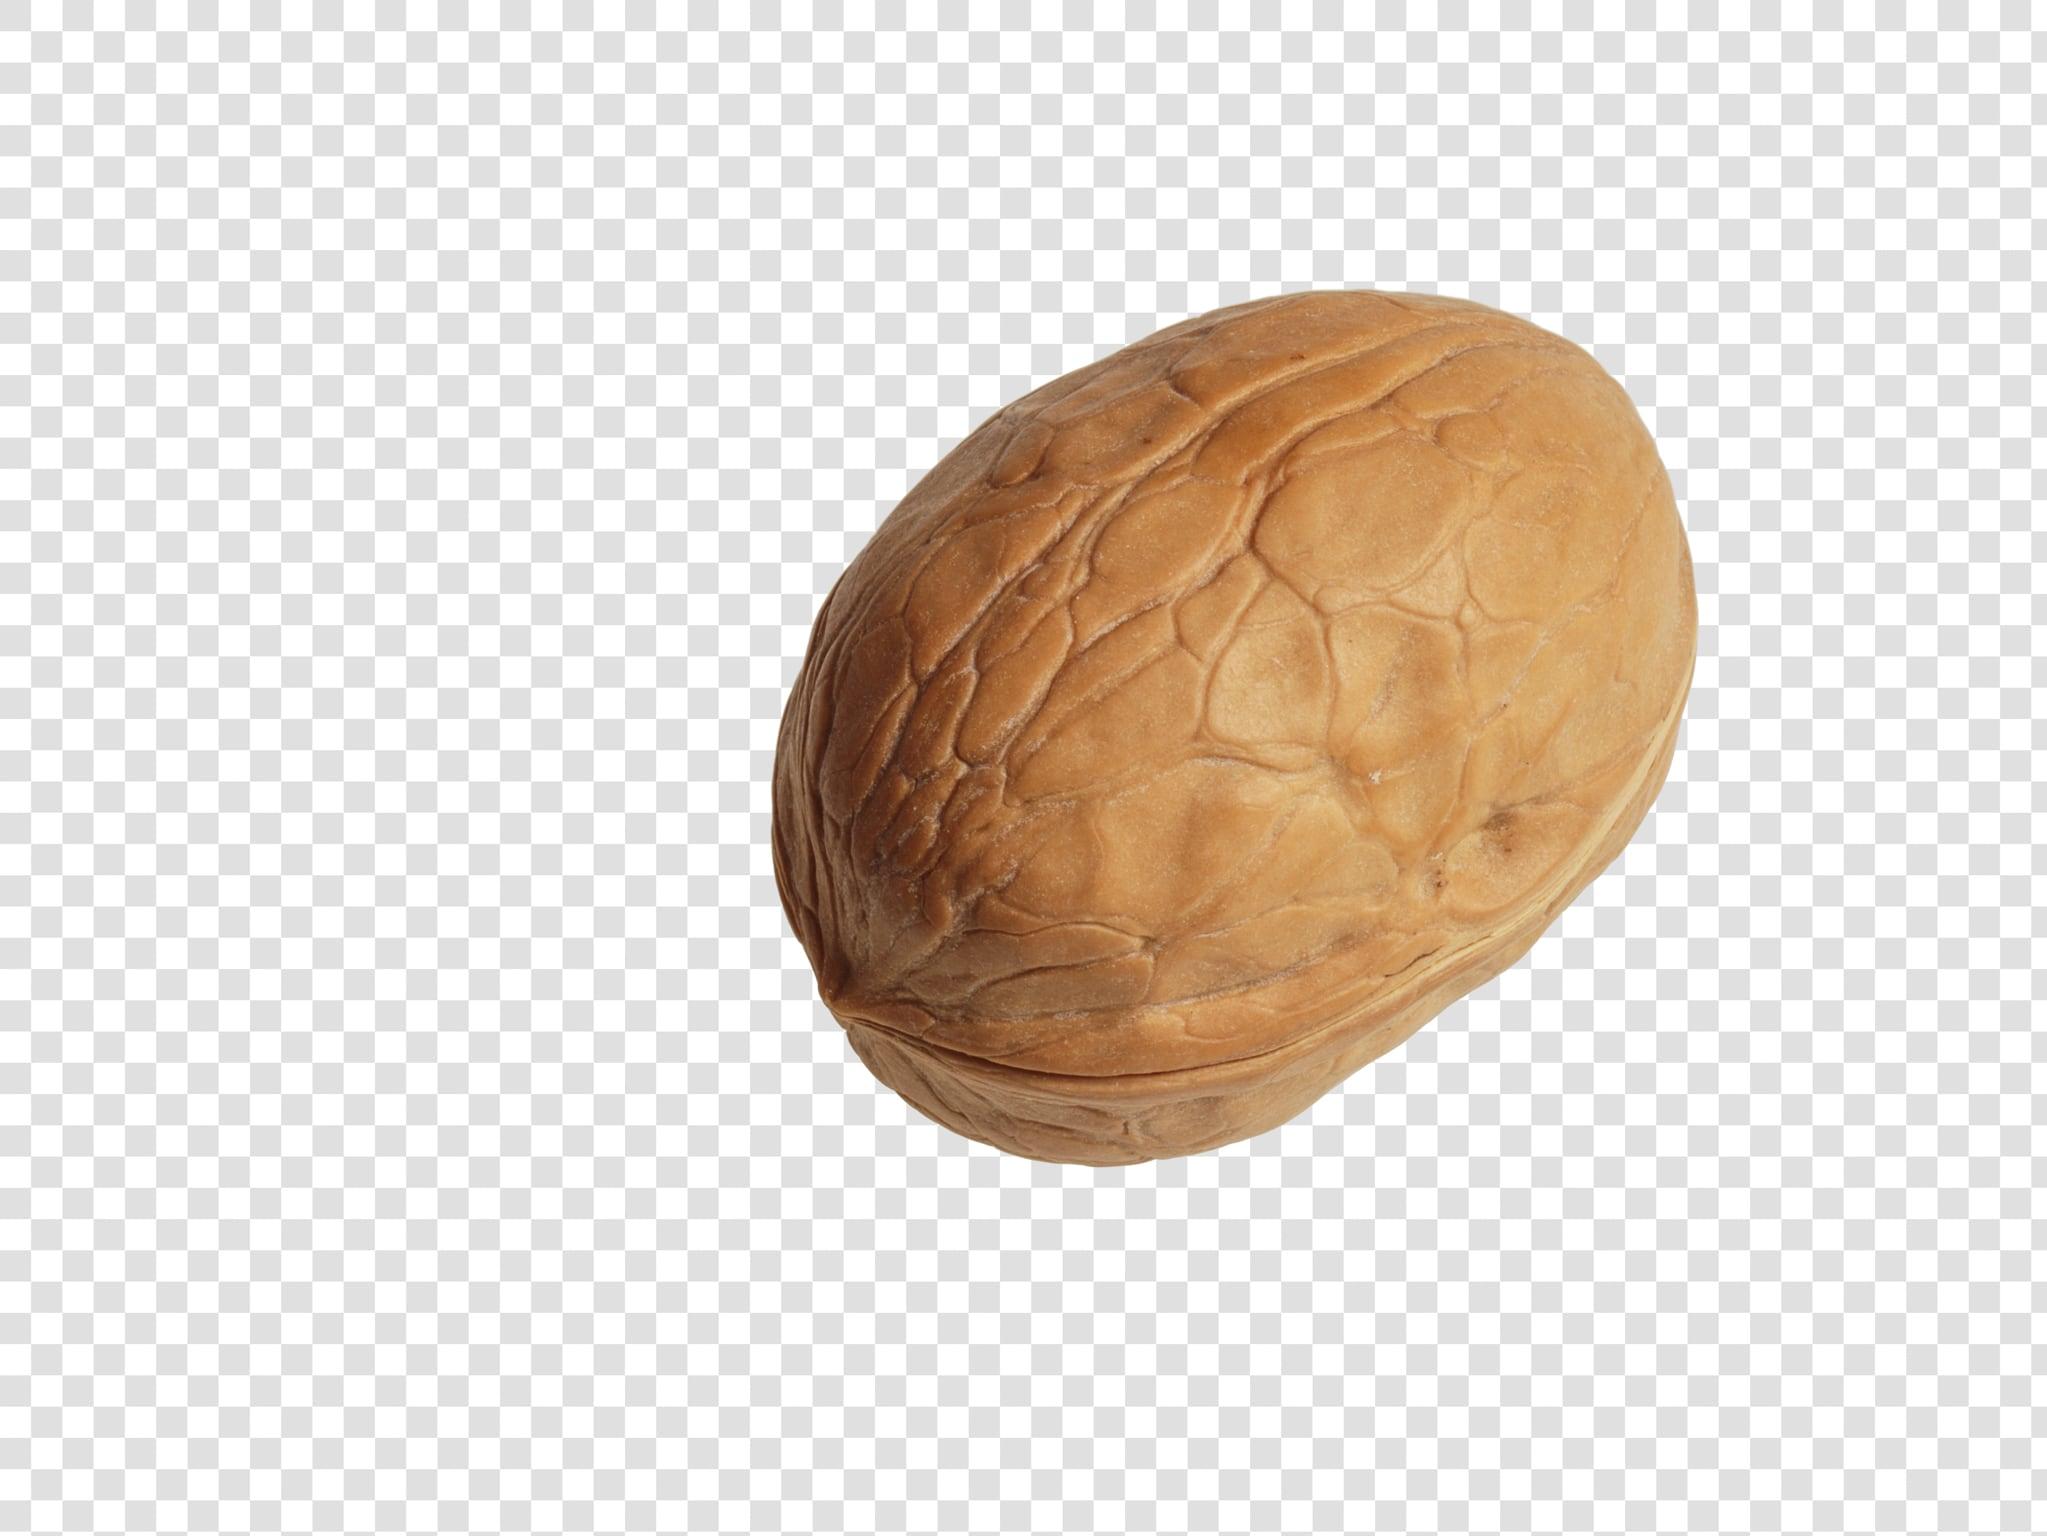 Walnut PSD isolated image